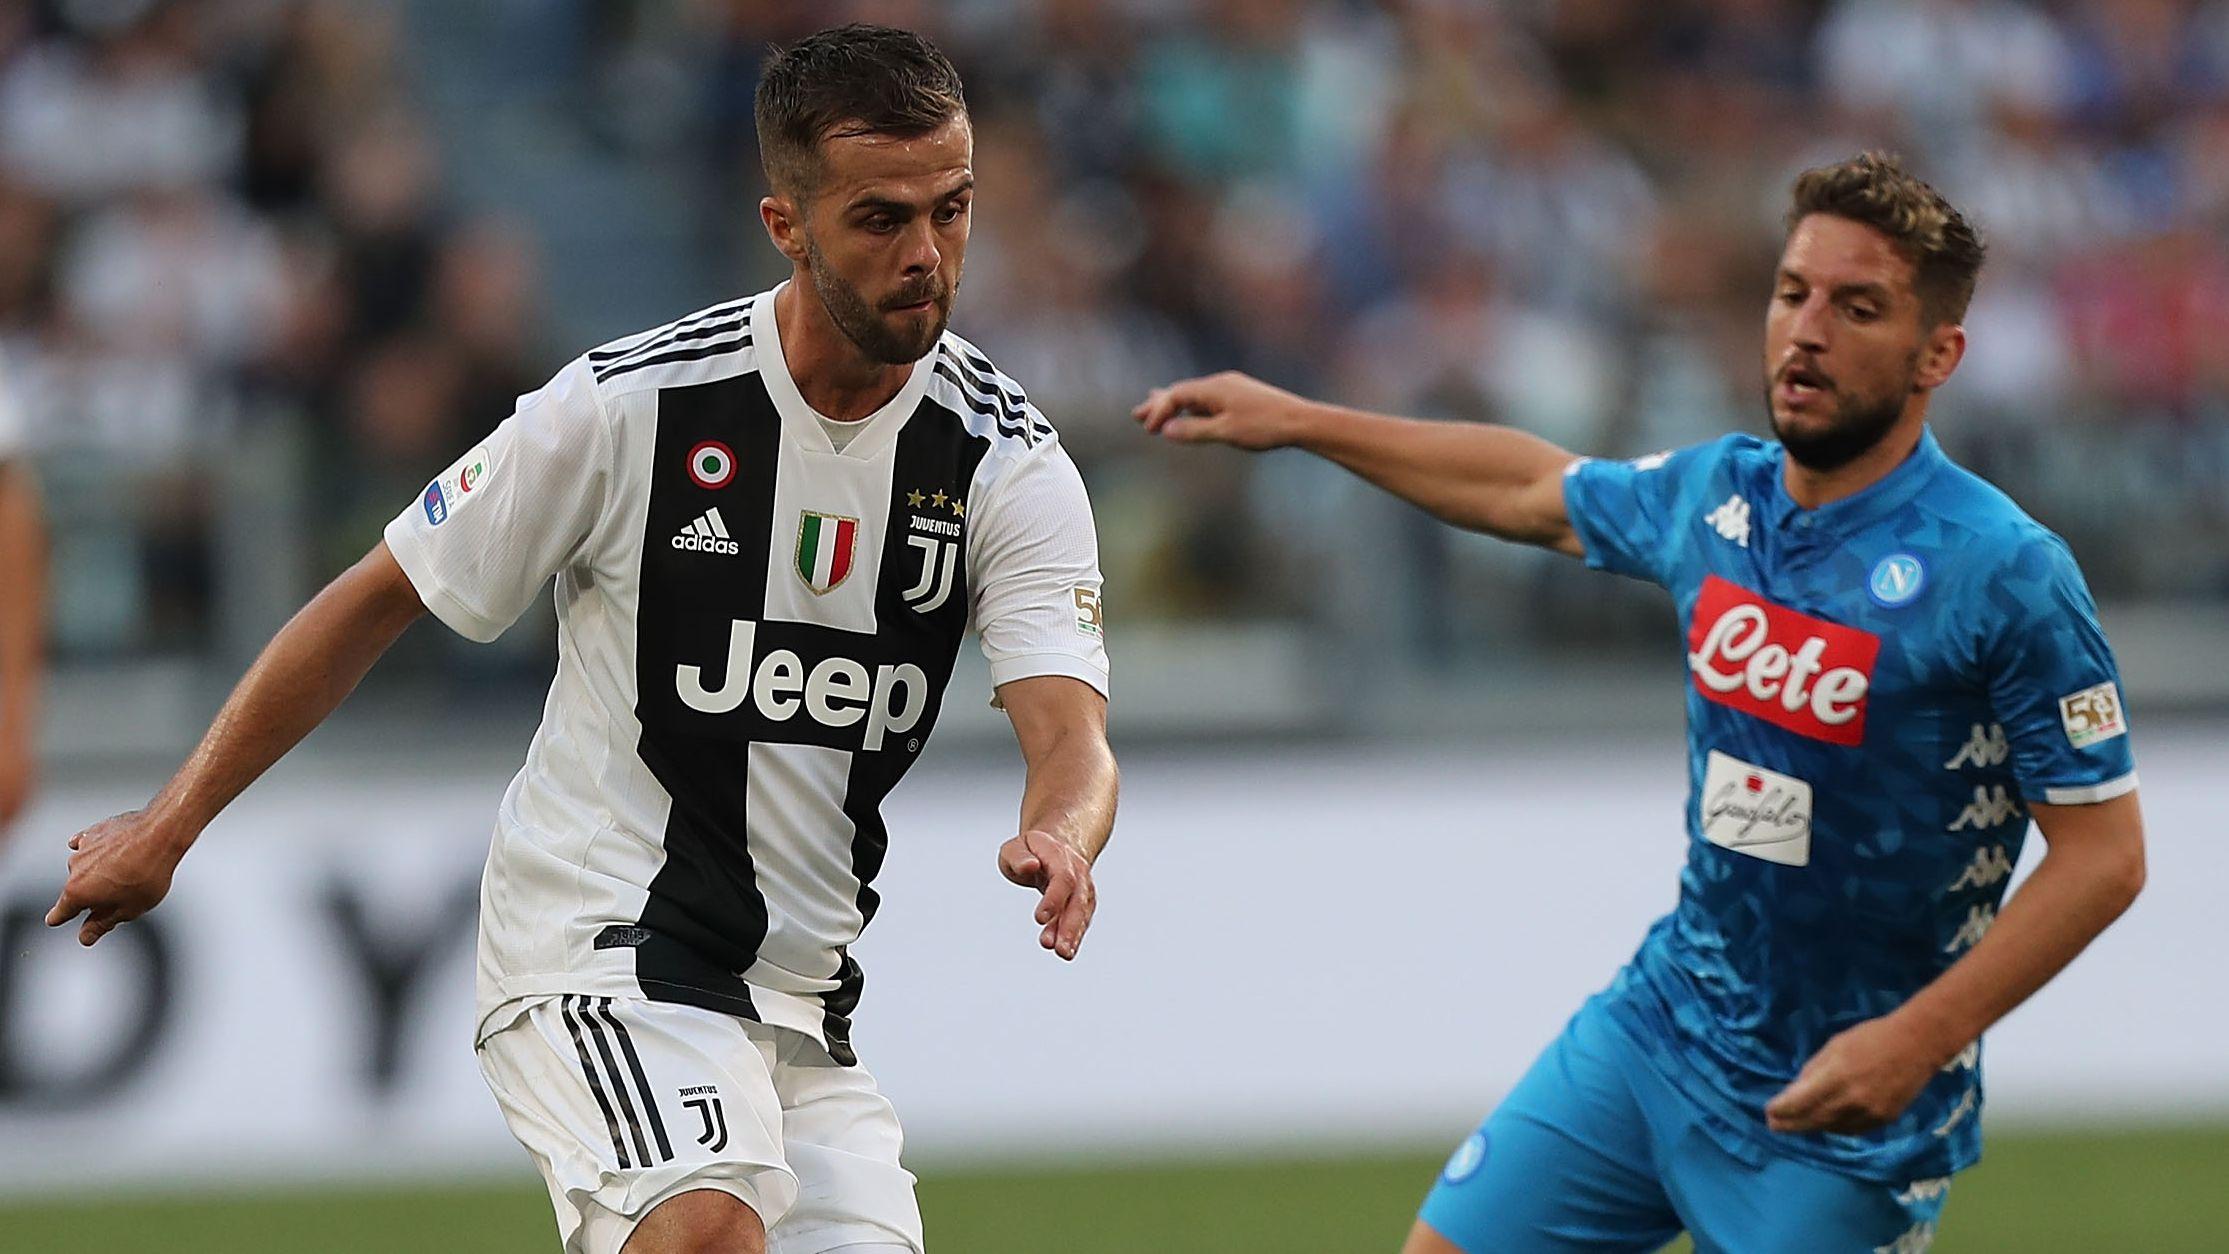 Pjanic Mertens Juventus Napoli